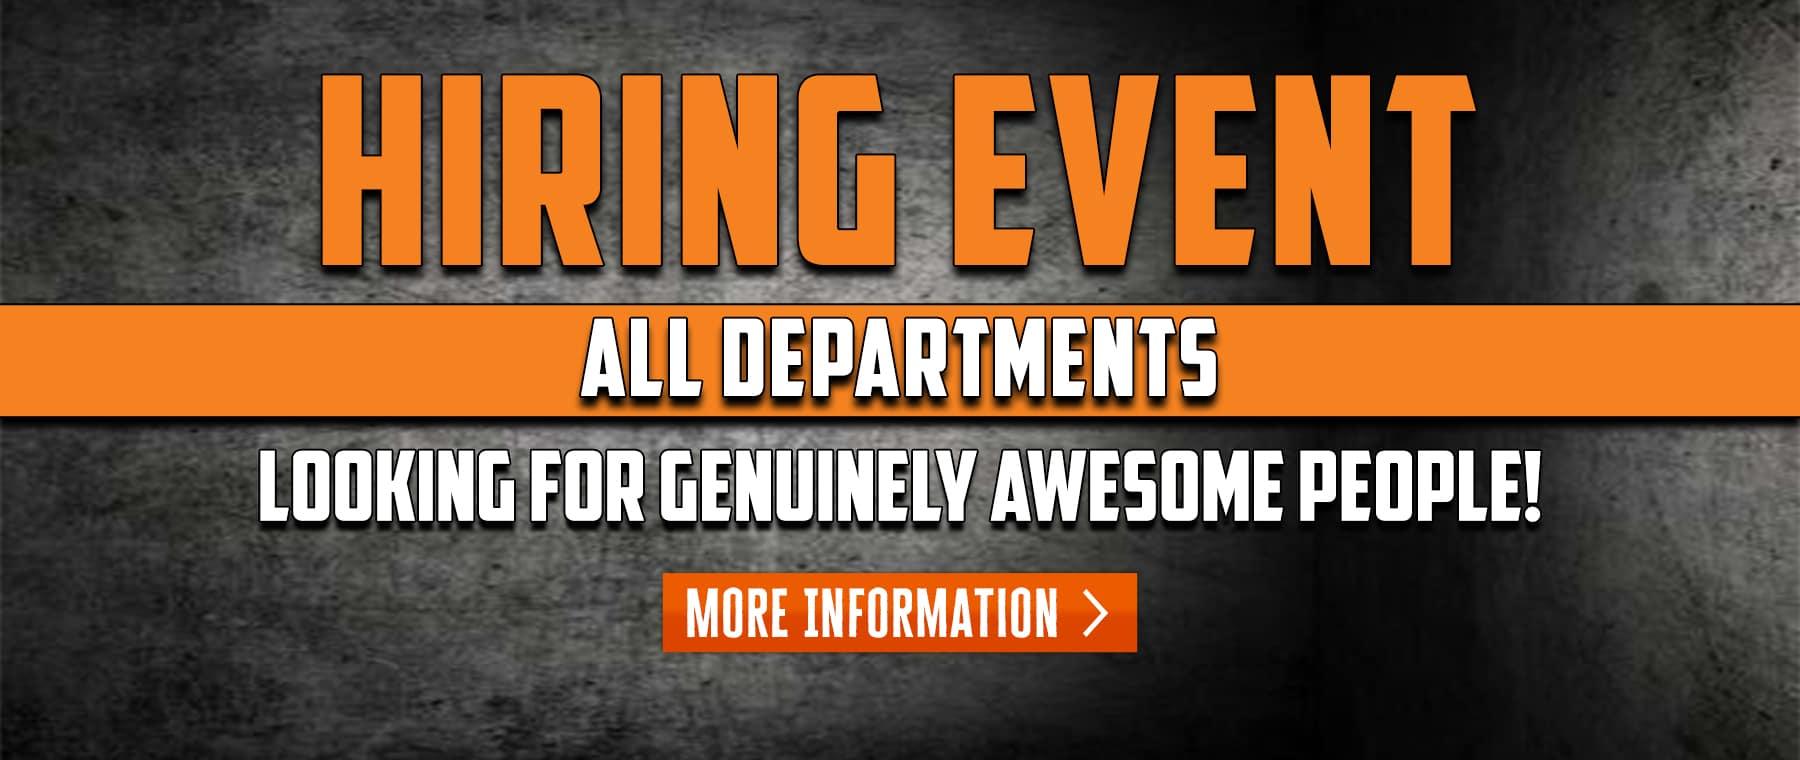 Hiring Event – Web Banner